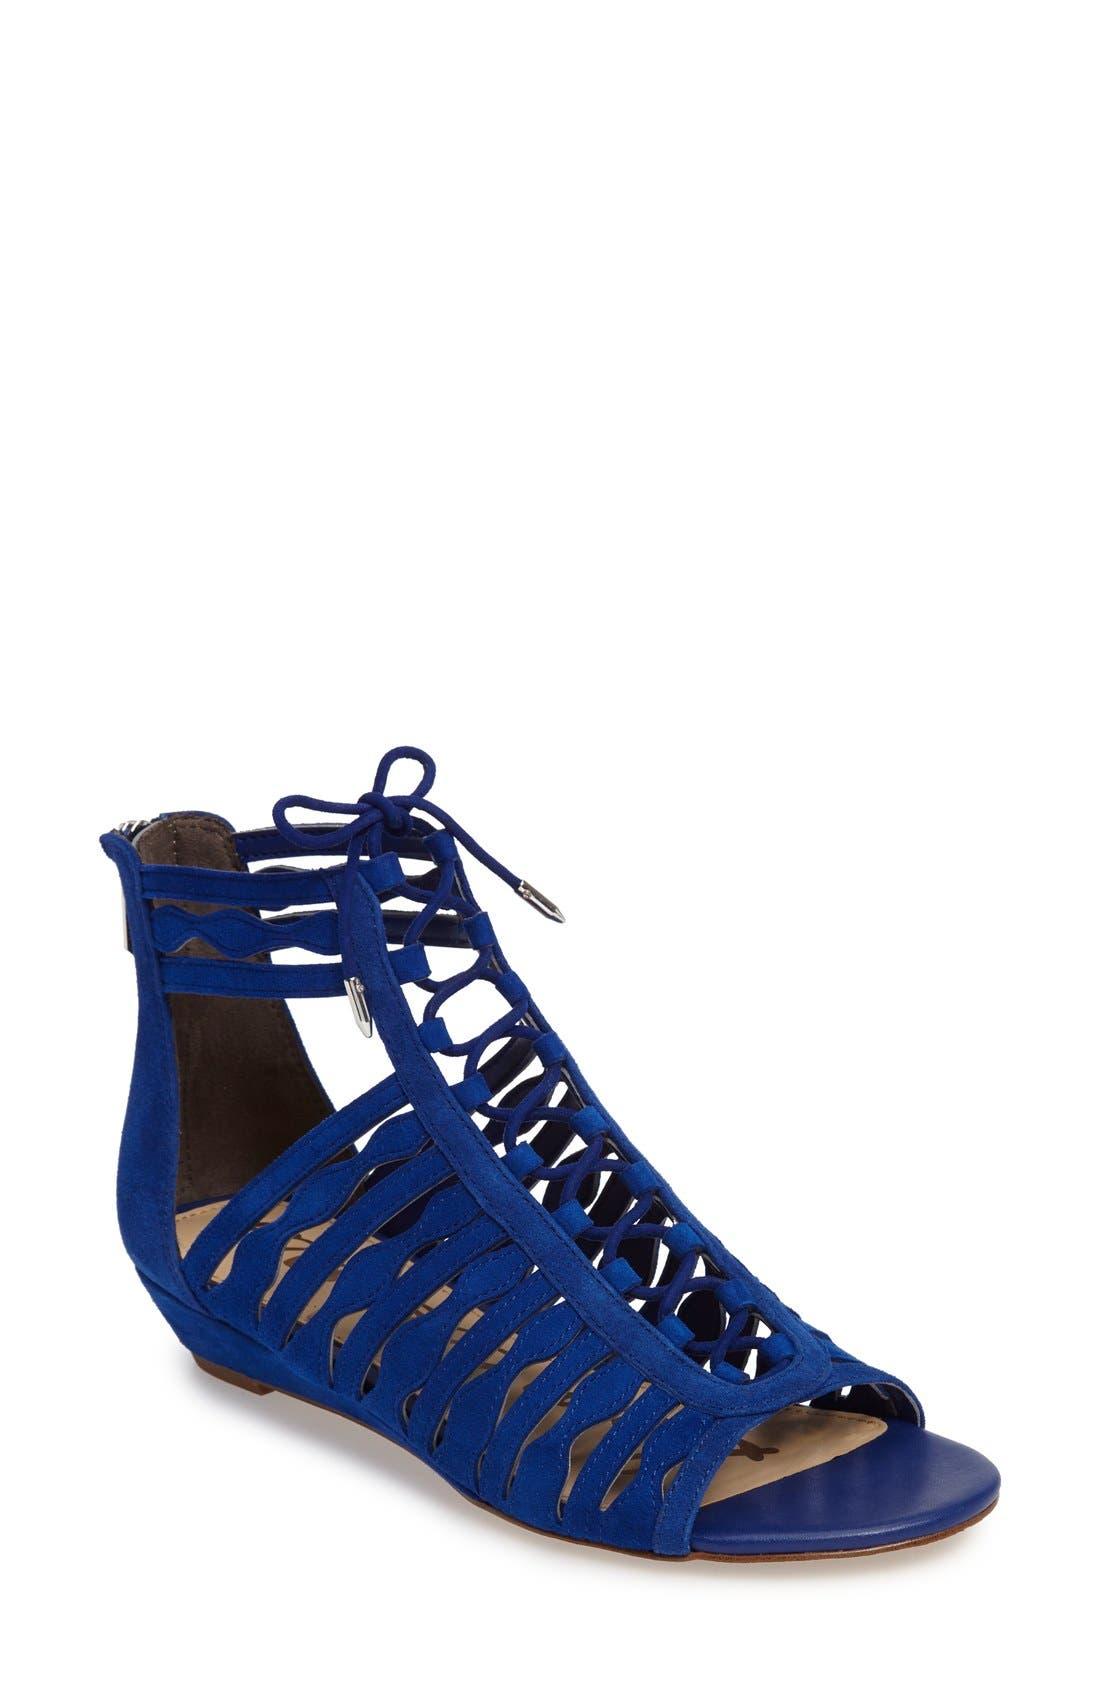 Alternate Image 1 Selected - Sam Edelman Daleece Lace-Up Sandal (Women)